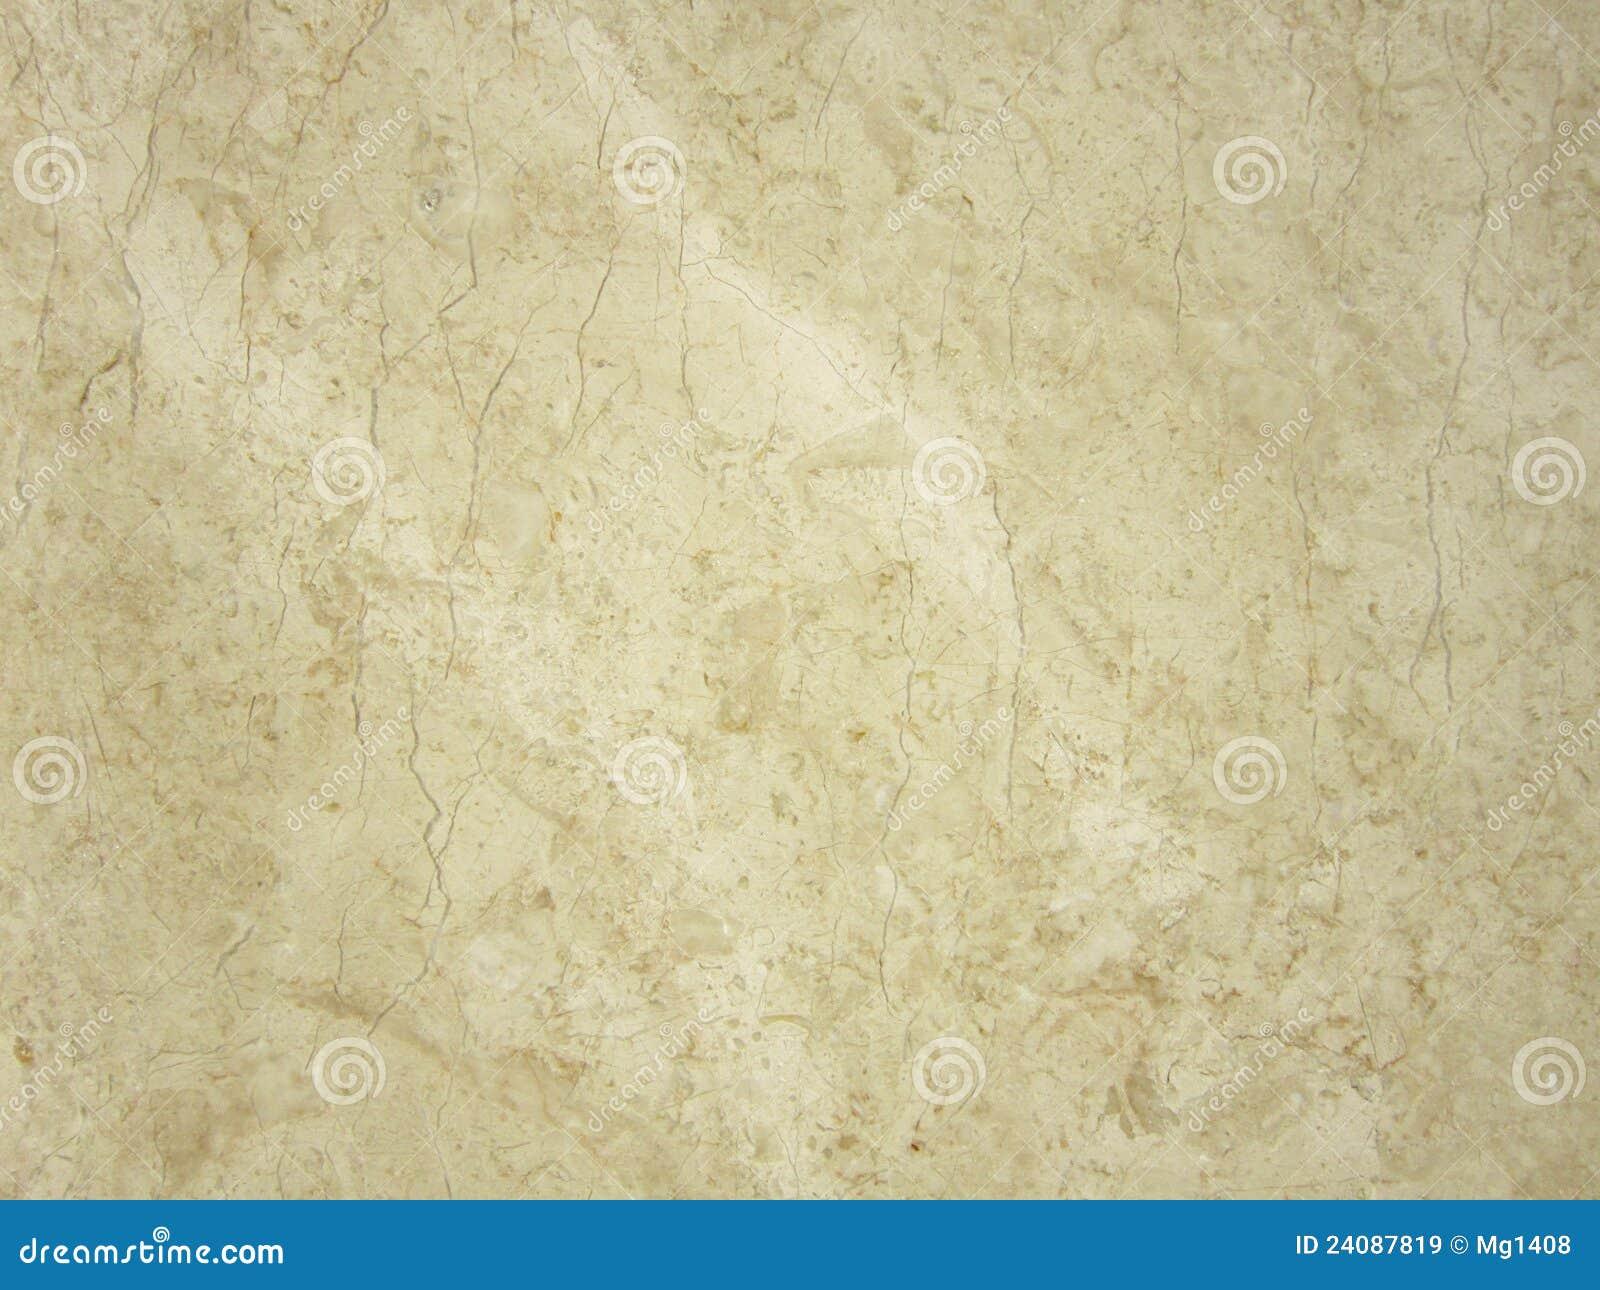 texture de marbre beige images libres de droits image 24087819. Black Bedroom Furniture Sets. Home Design Ideas